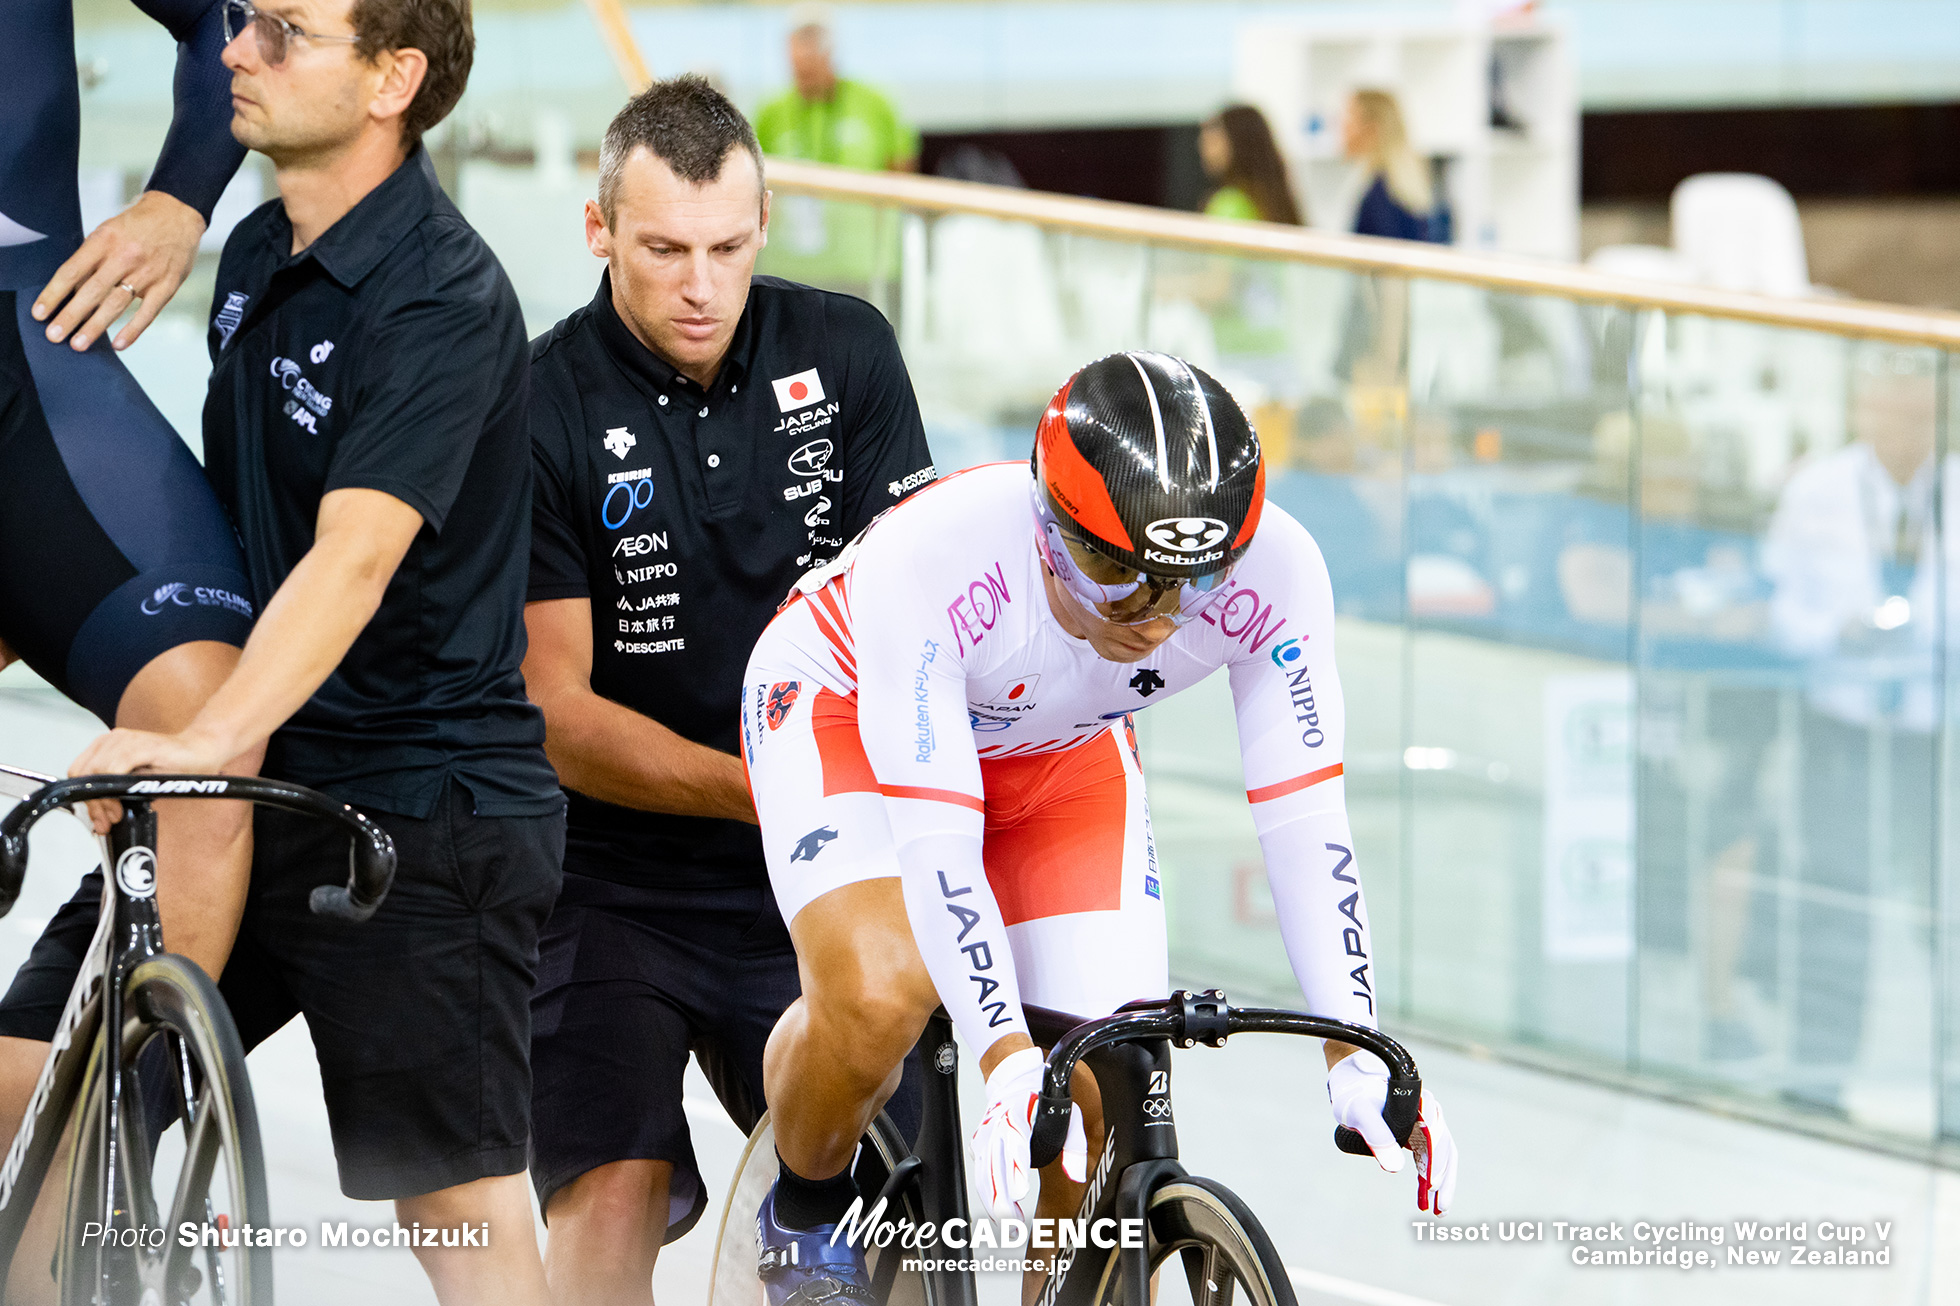 Final / Men's Keirin / Track Cycling World Cup V / Cambridge, New Zealand